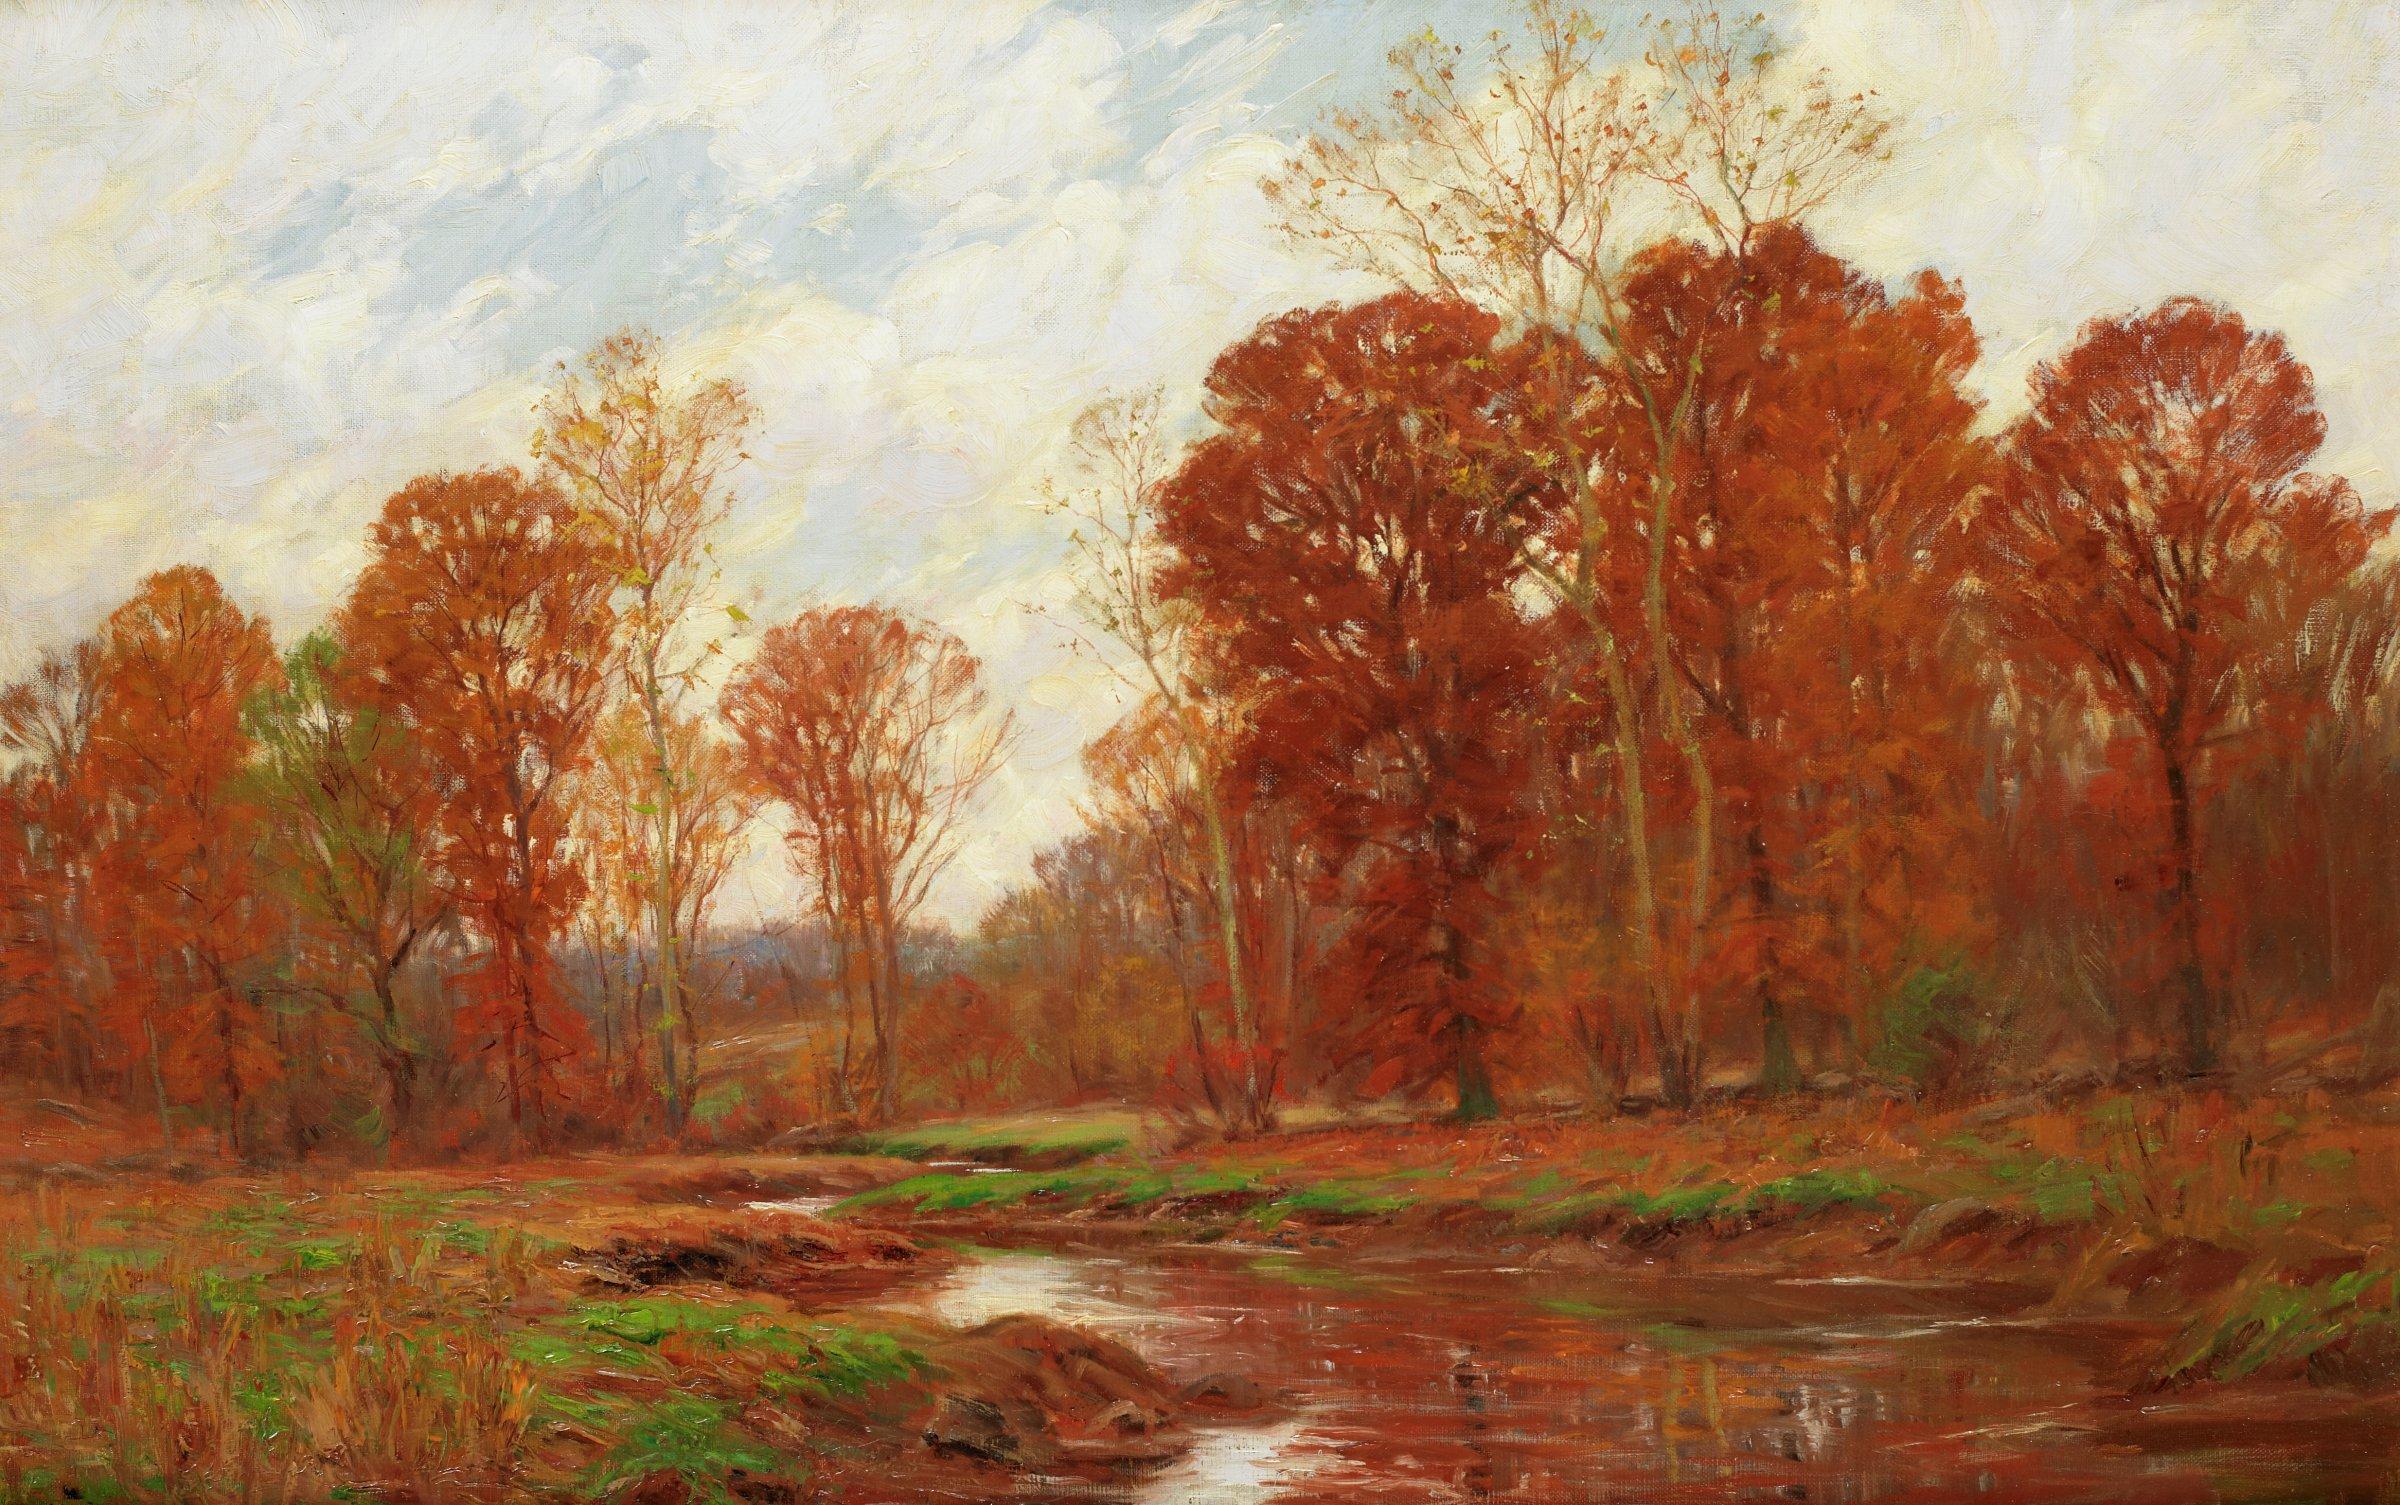 Autumn Landscape, William Merritt Post, oil on canvas